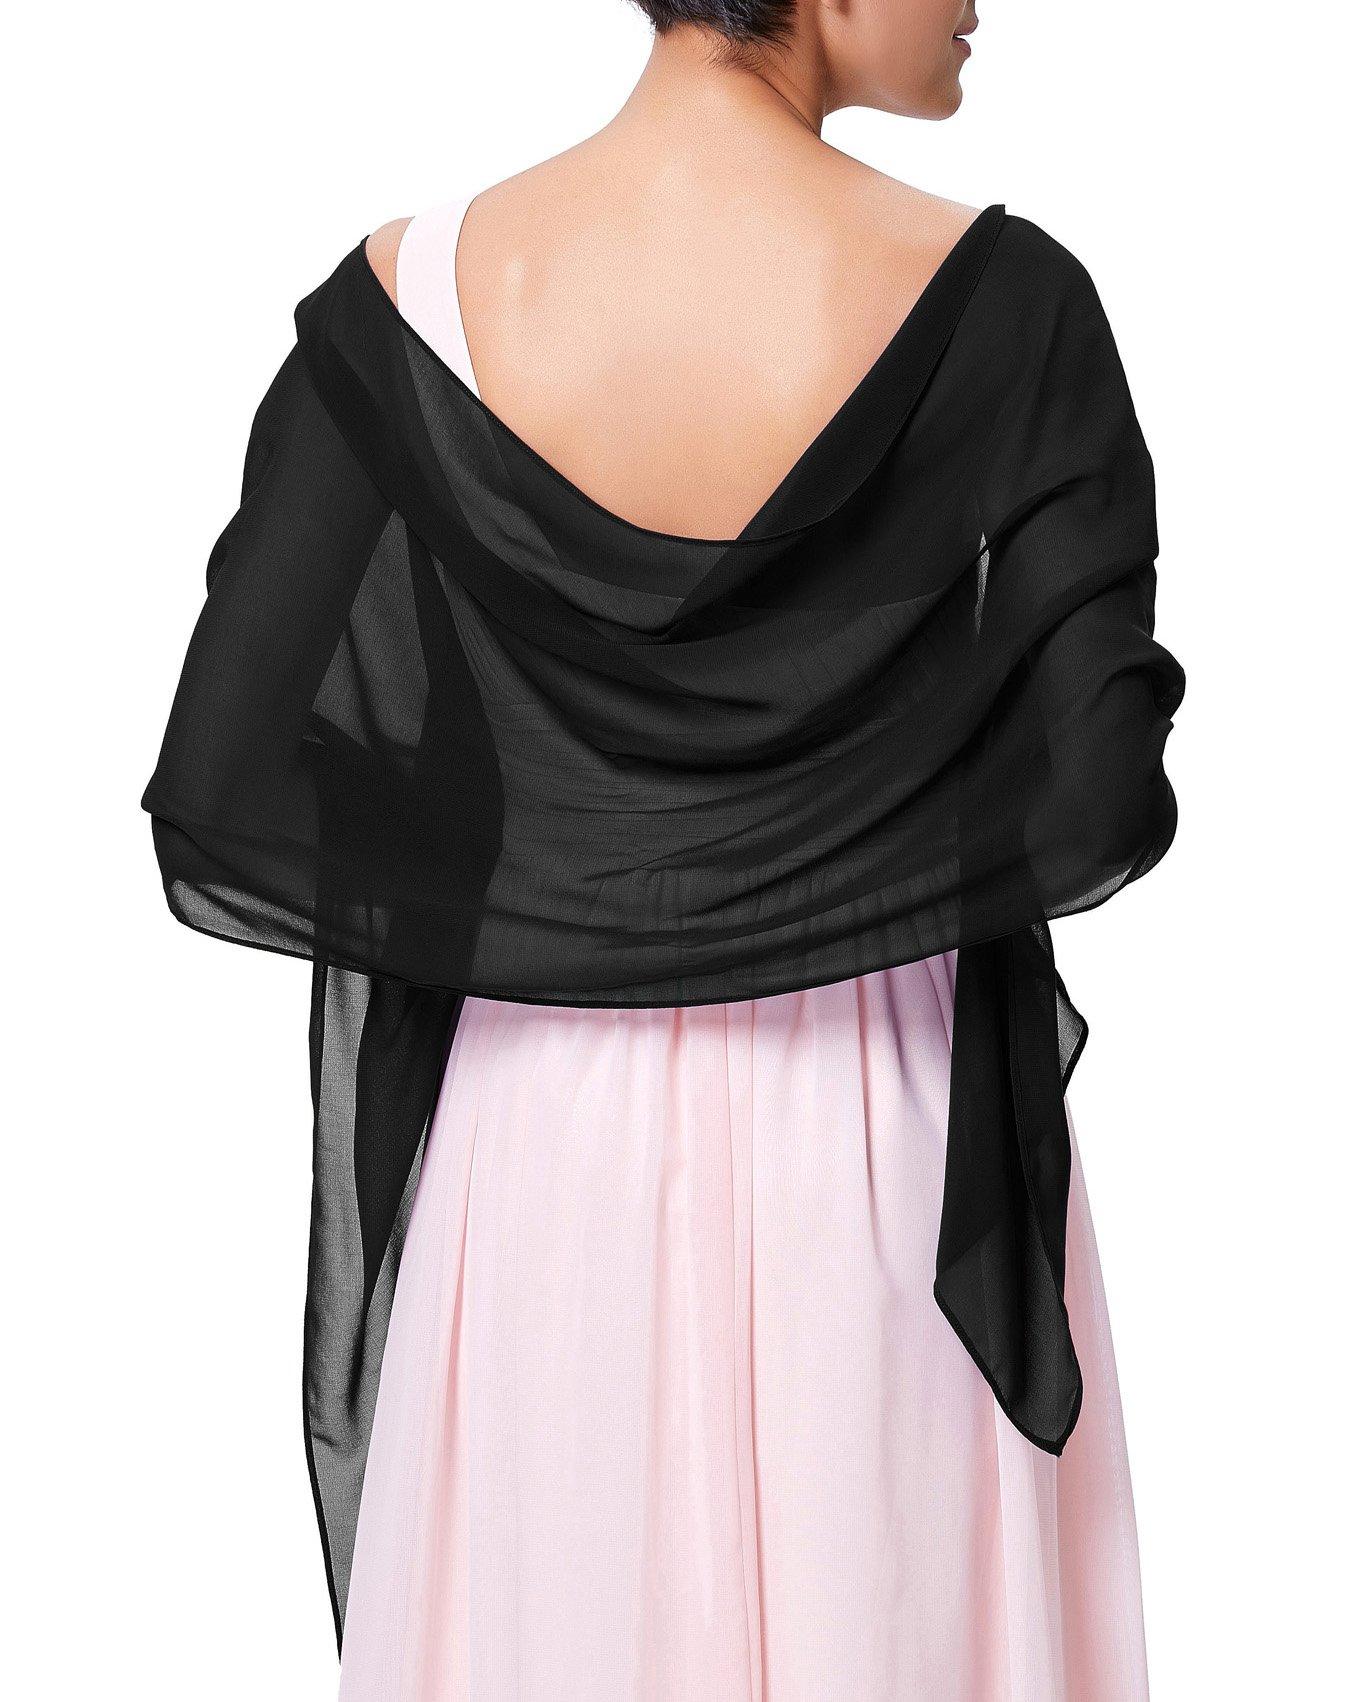 Kate Kasin Black Chiffon Bridal Evening Party Scarves Shawls KK229